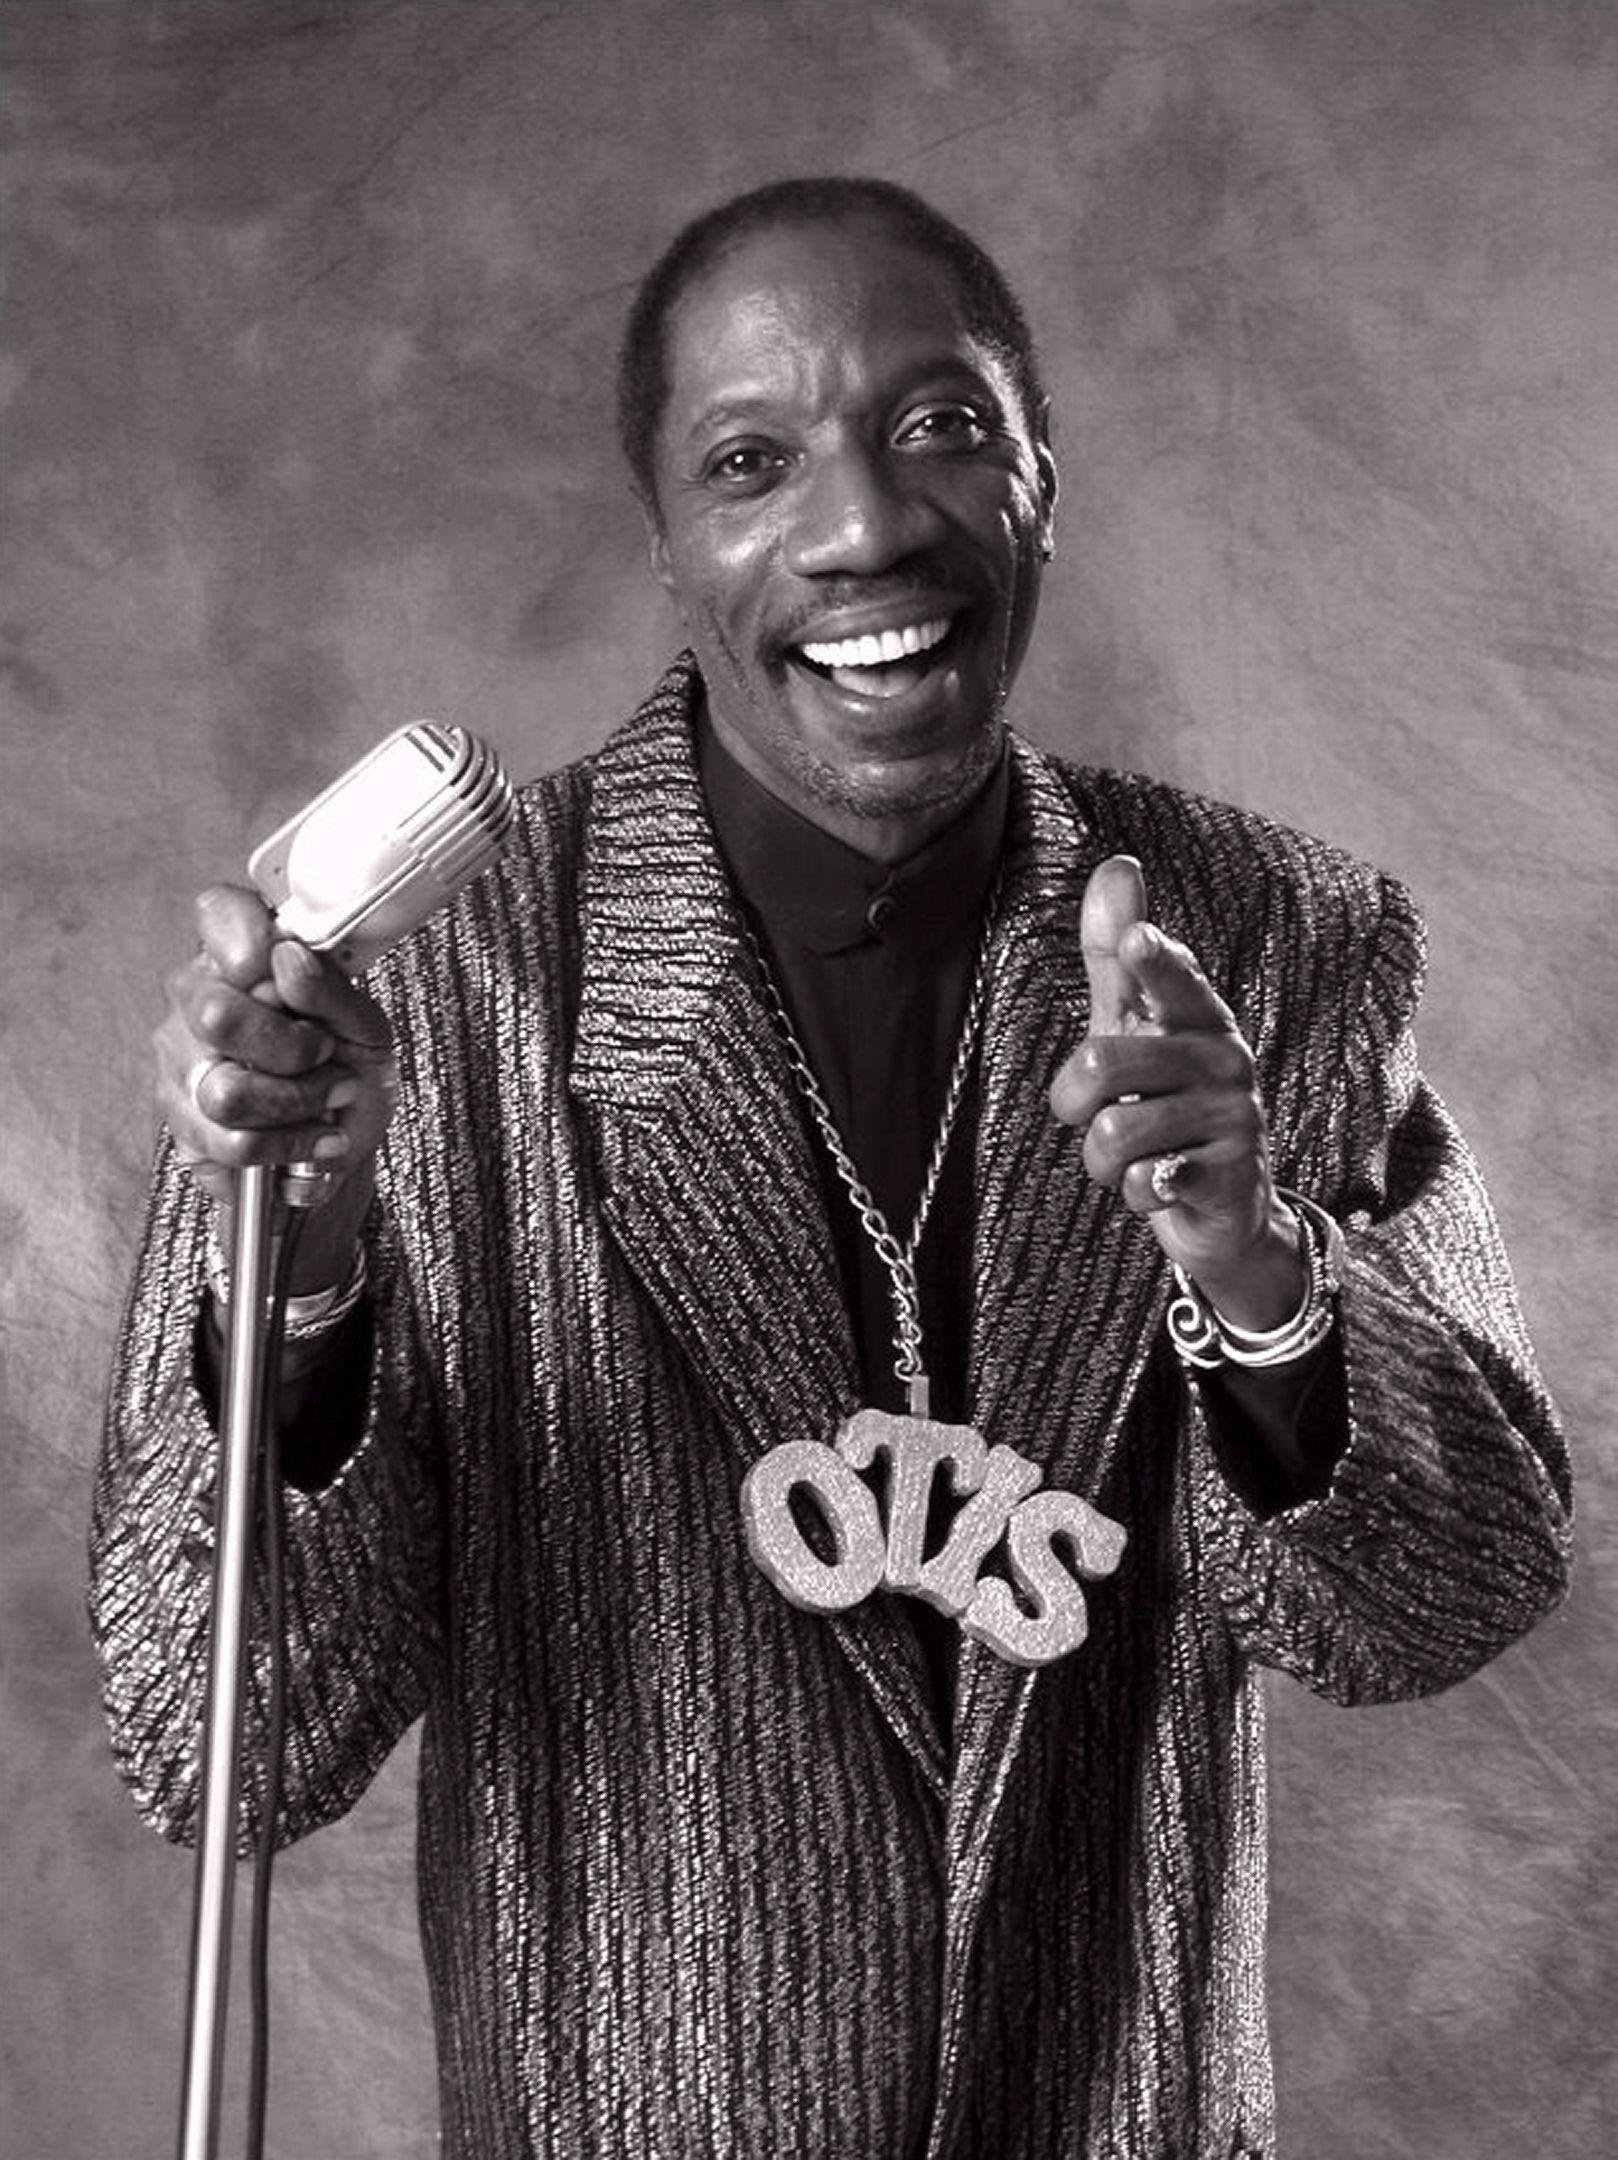 MC  Otis002.jpg